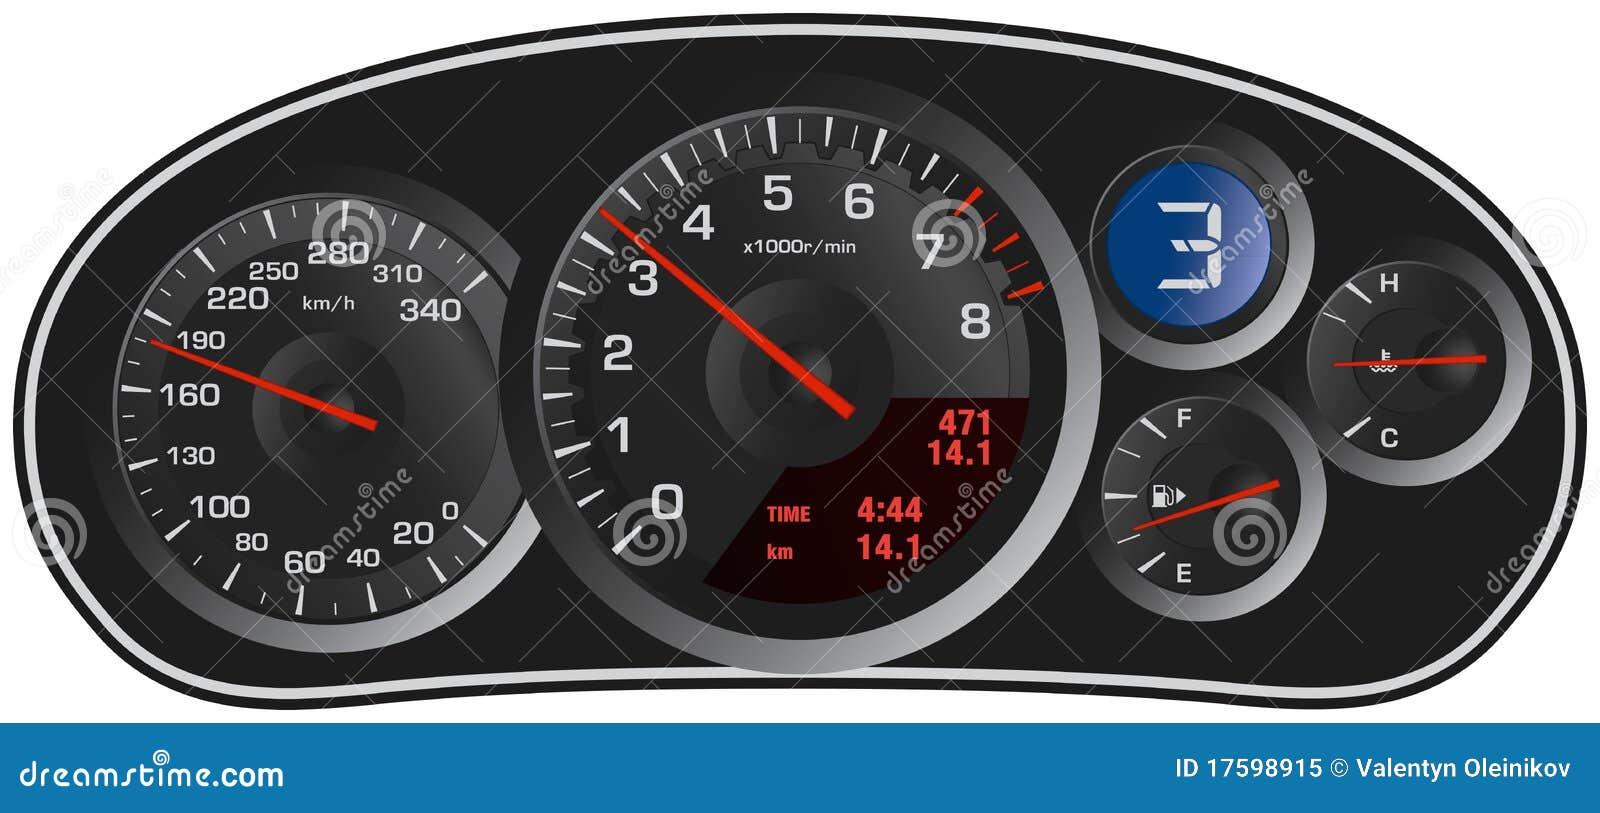 Car Dashboard Icons Set Stock Vector Illustration Of Battery - Car image sign of dashboardcar dashboard icons stock images royaltyfree imagesvectors